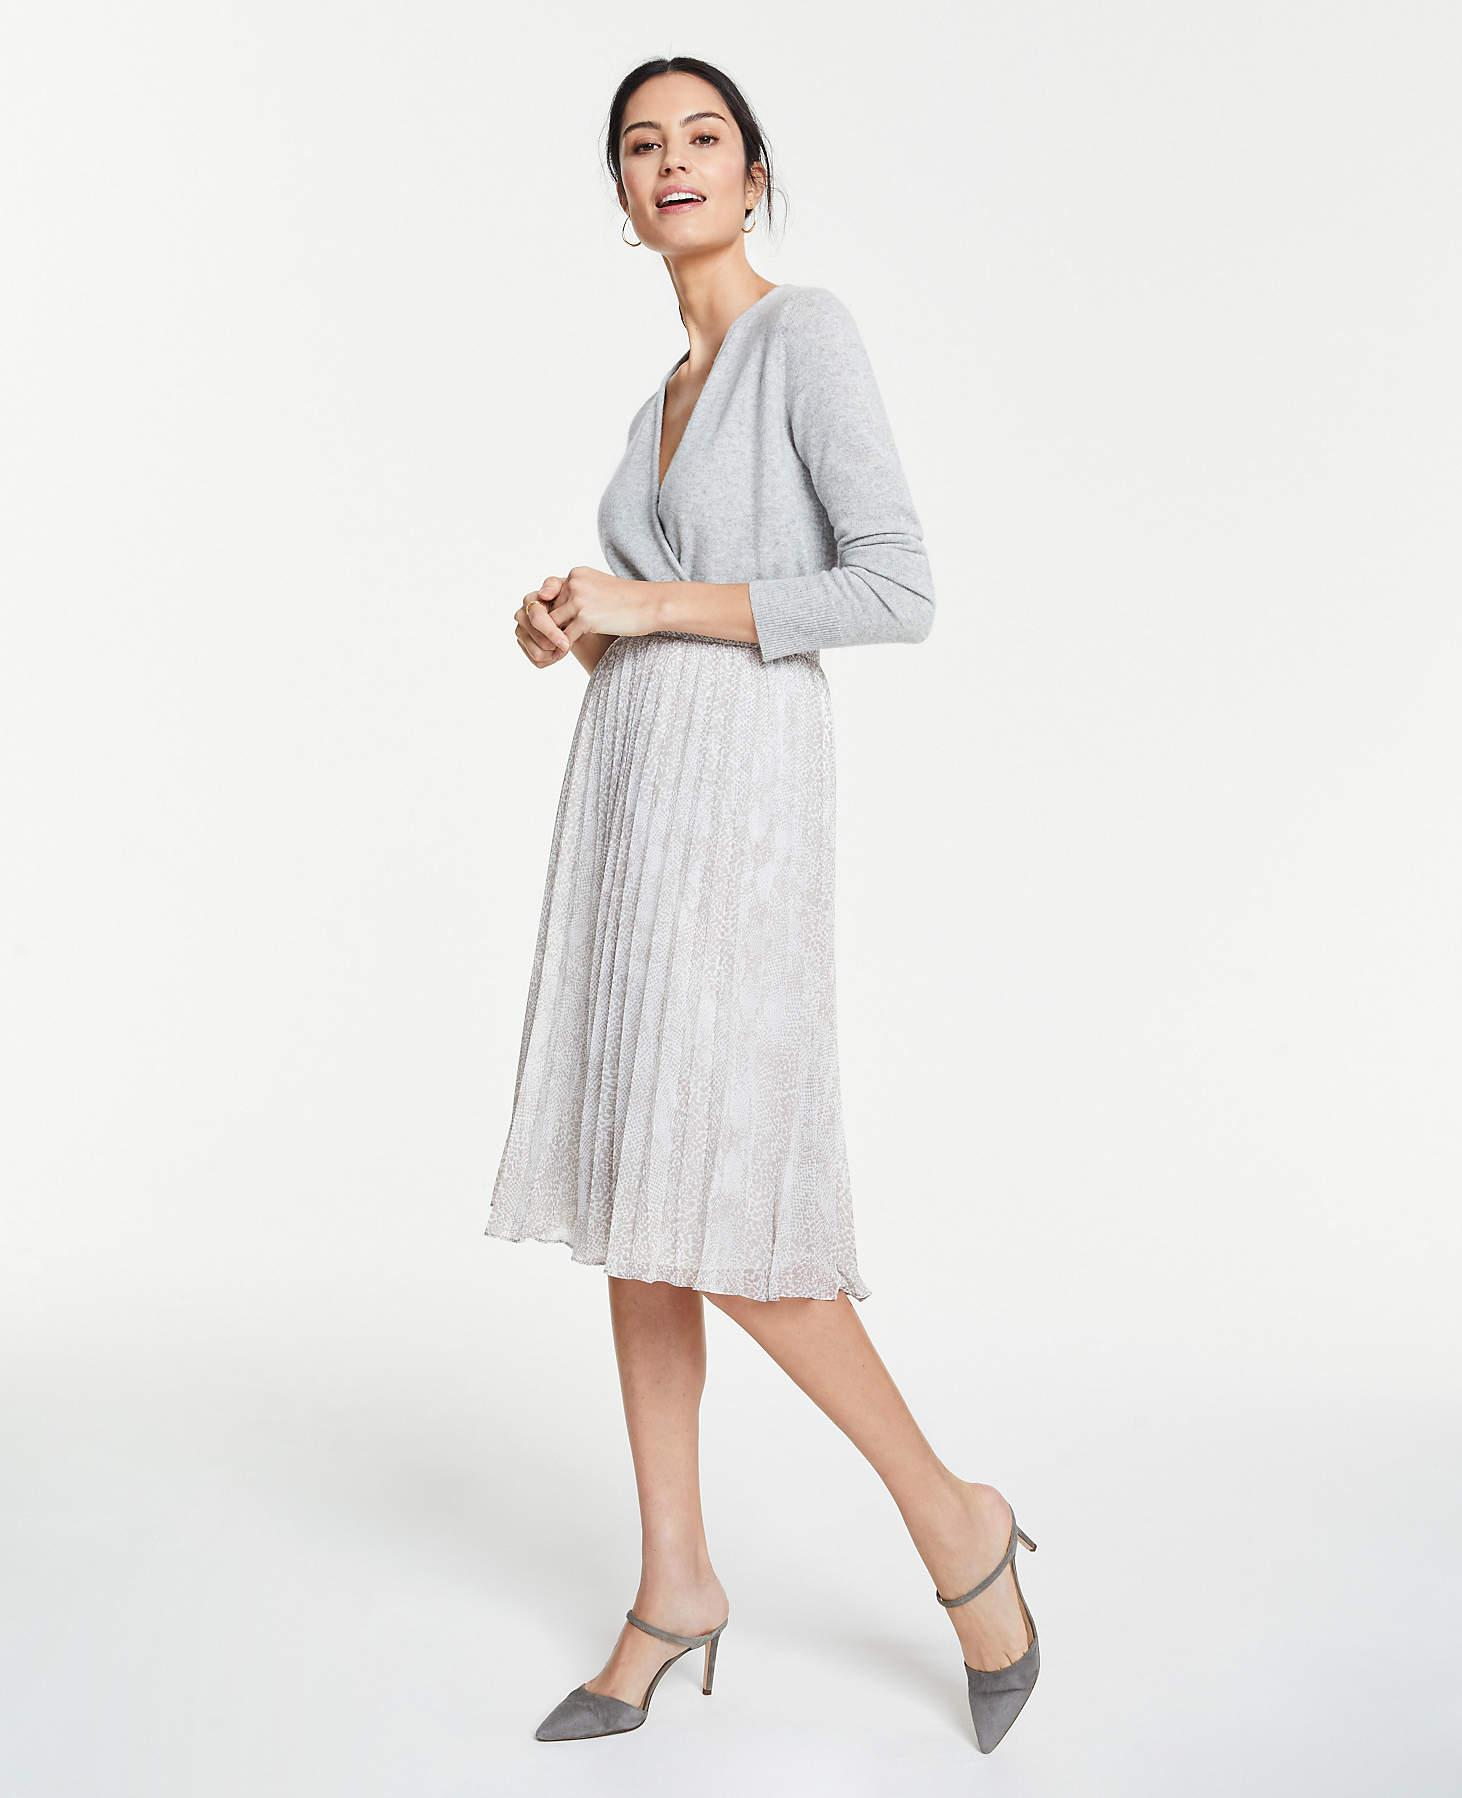 768bd5ef193 Ann Taylor Petite Snakeskin Print Pleated Midi Skirt in White - Lyst